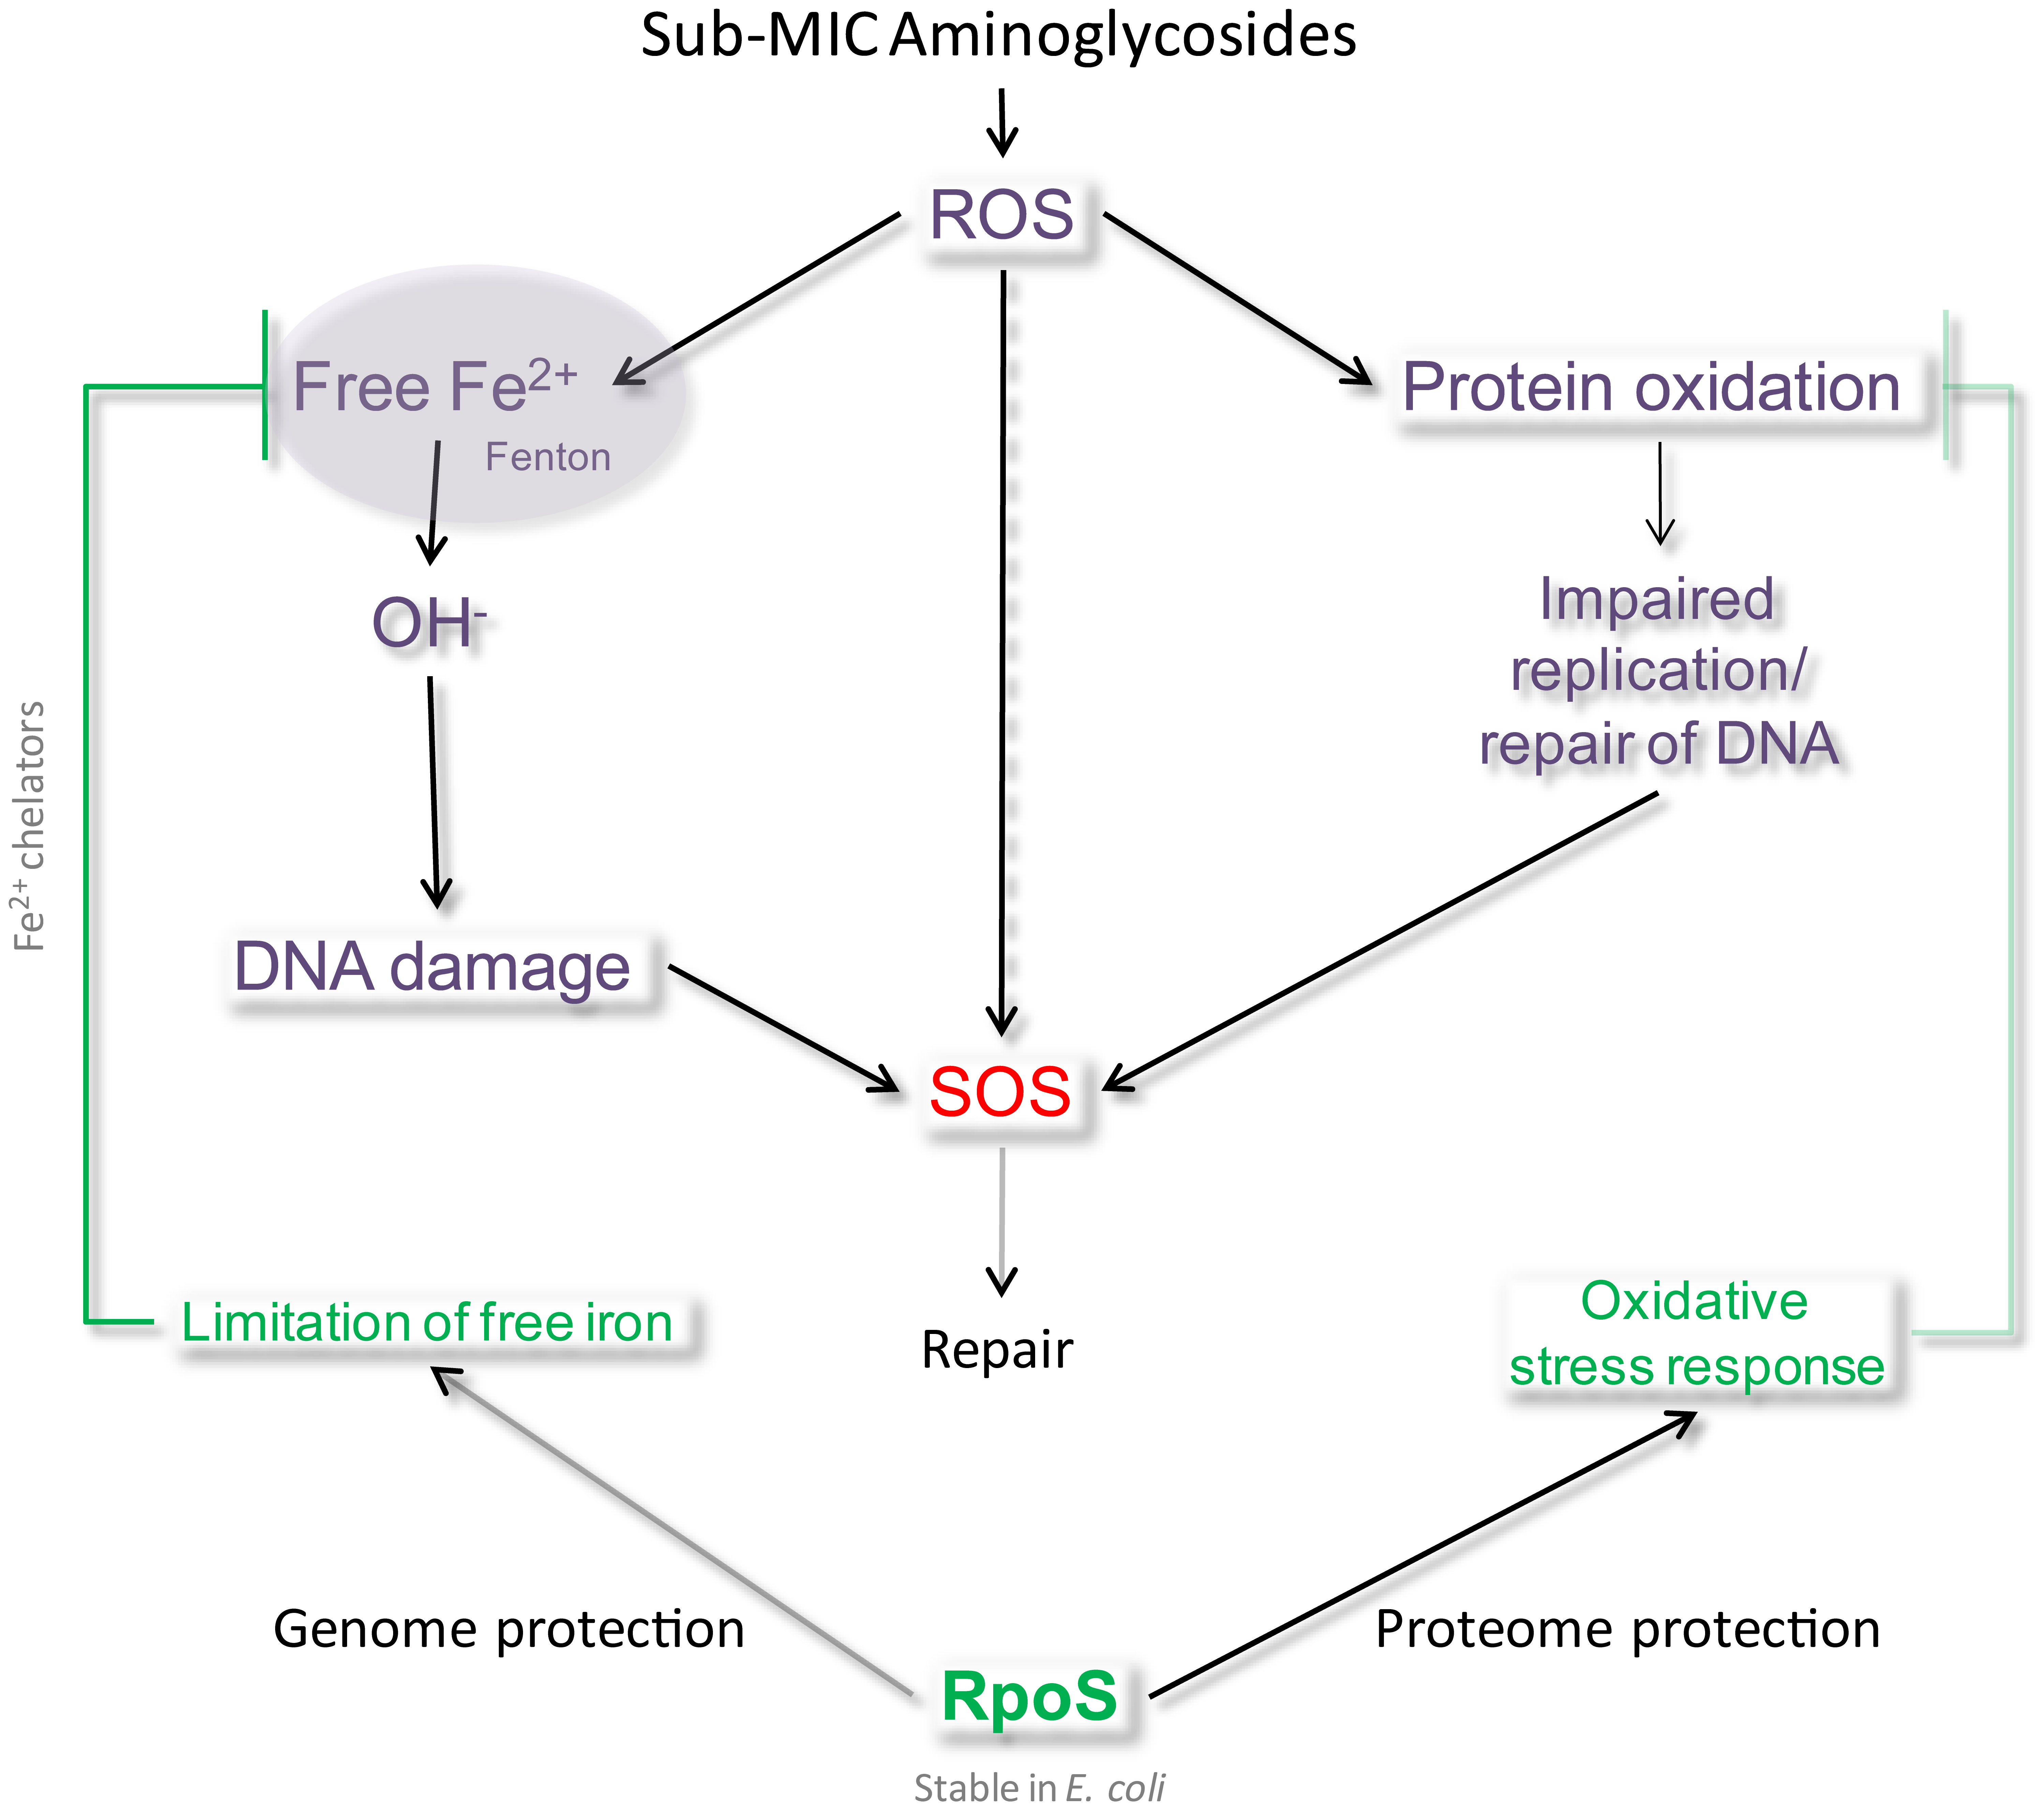 Model of SOS induction by sub-MIC aminoglycosides.